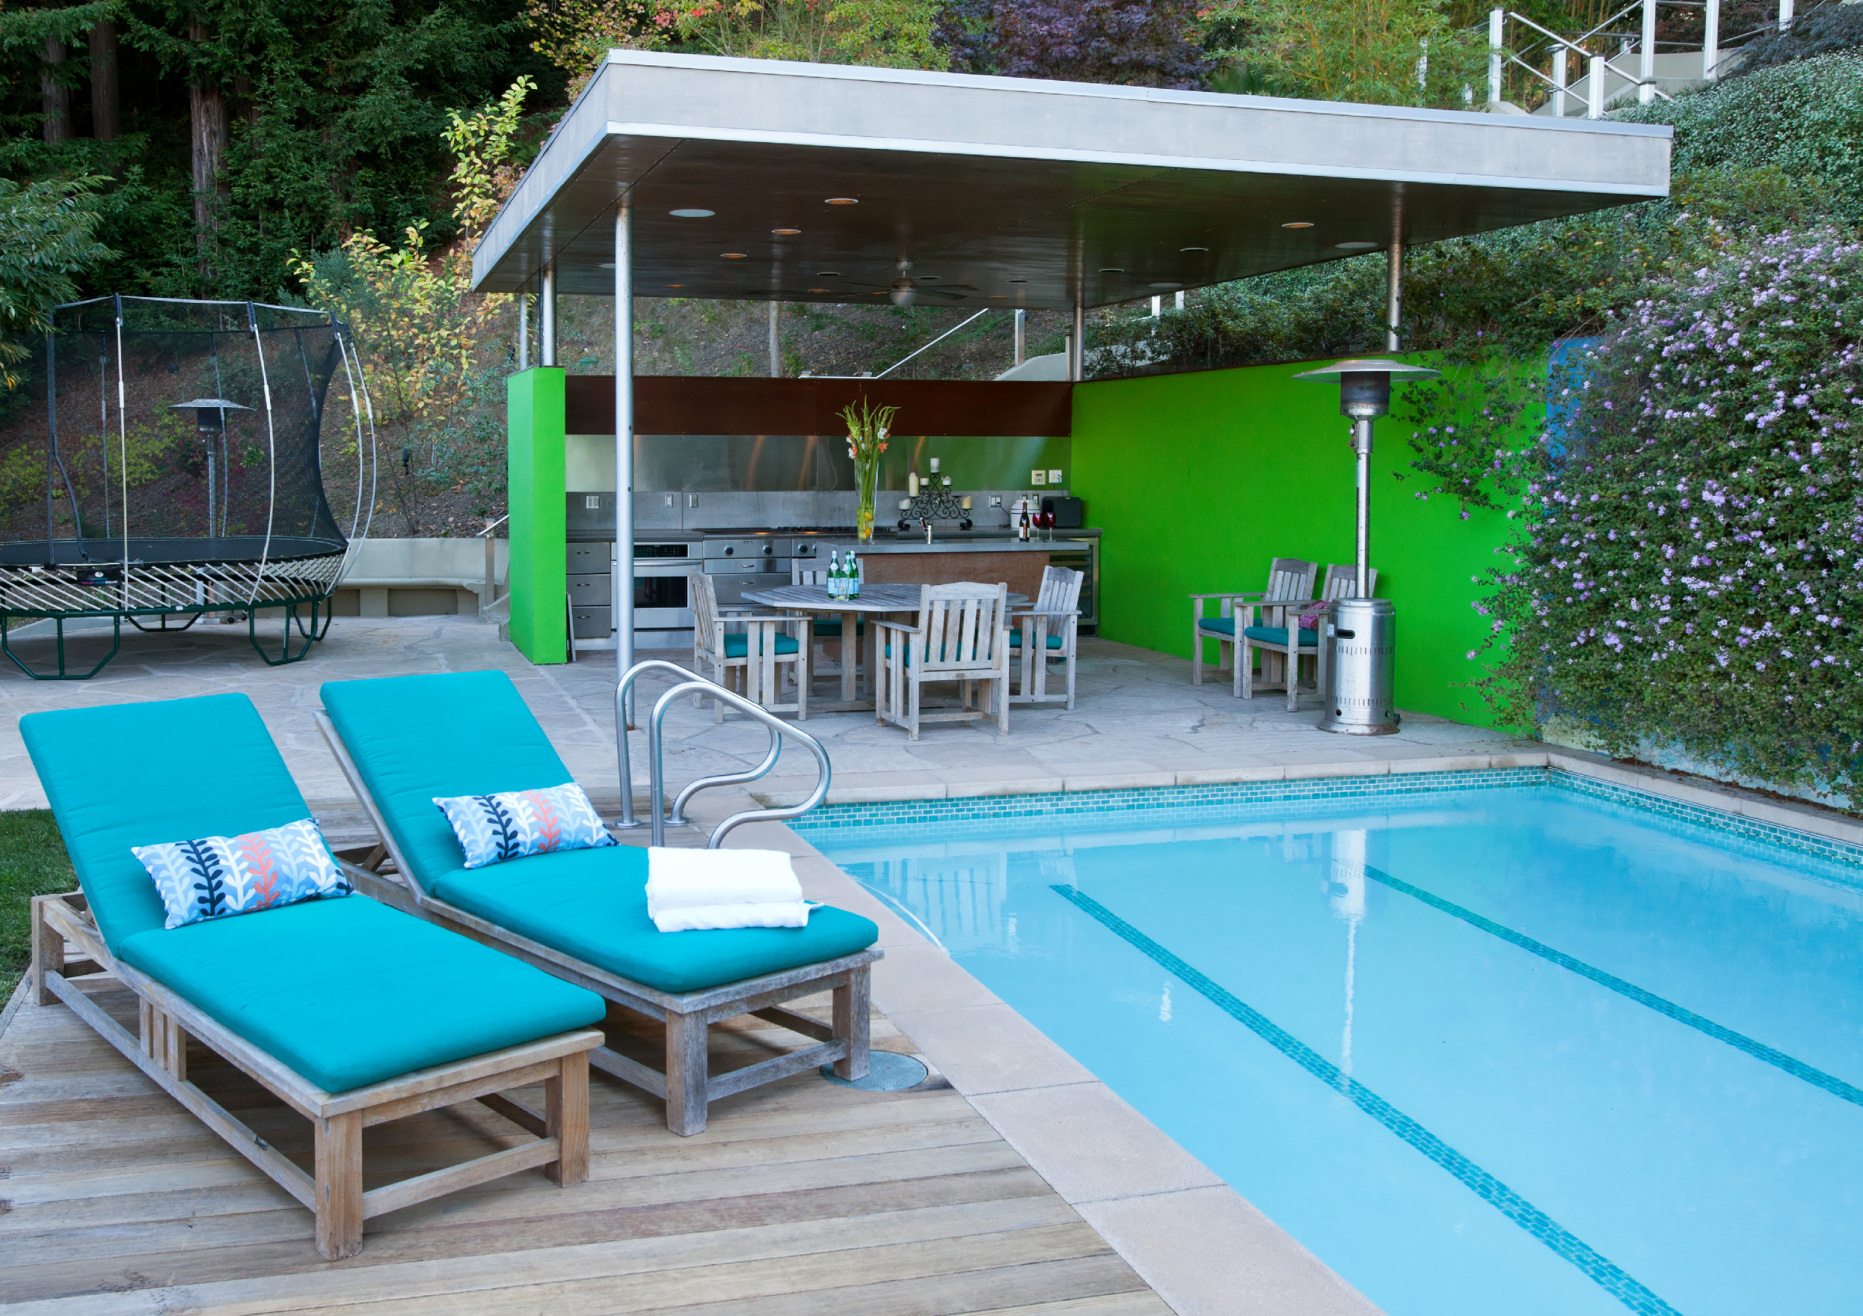 Unique Outdoor kitchen spacious public rooms make San Rafael estate an entertainer us paradise SFGate